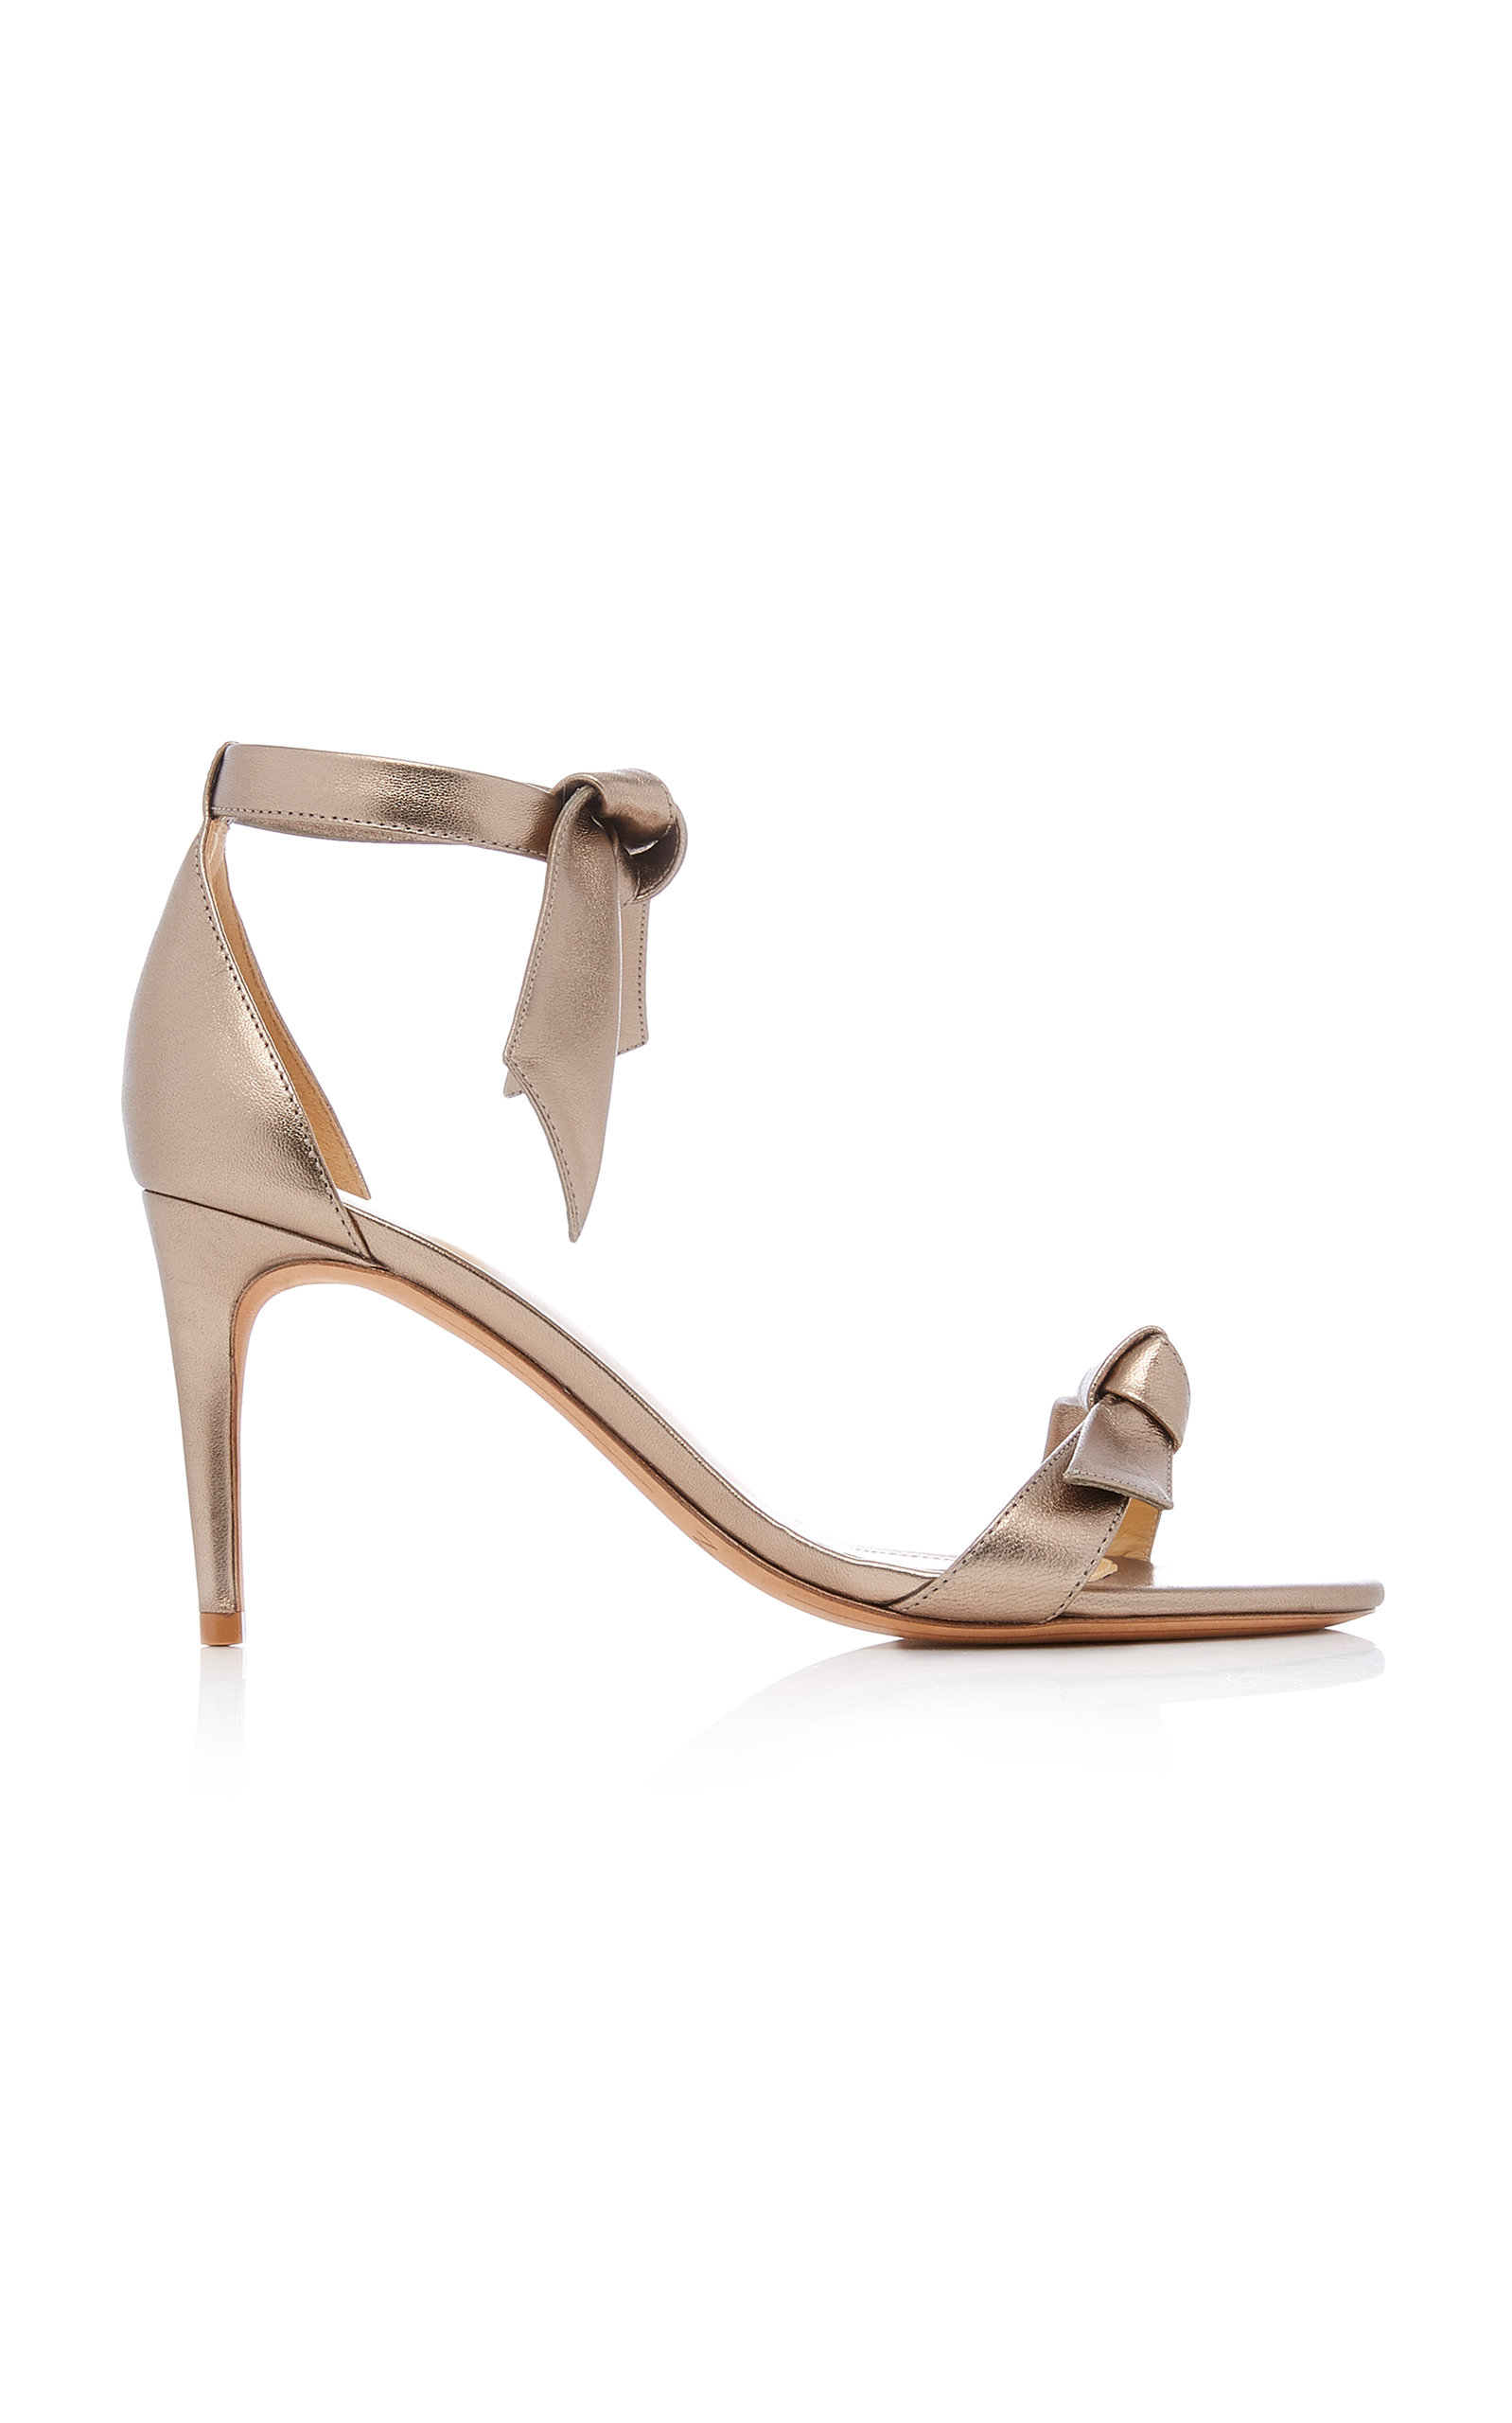 2a86a3eb376 Alexandre Birman Clarita Metallic Leather Ankle-Tie Sandal In Gold ...